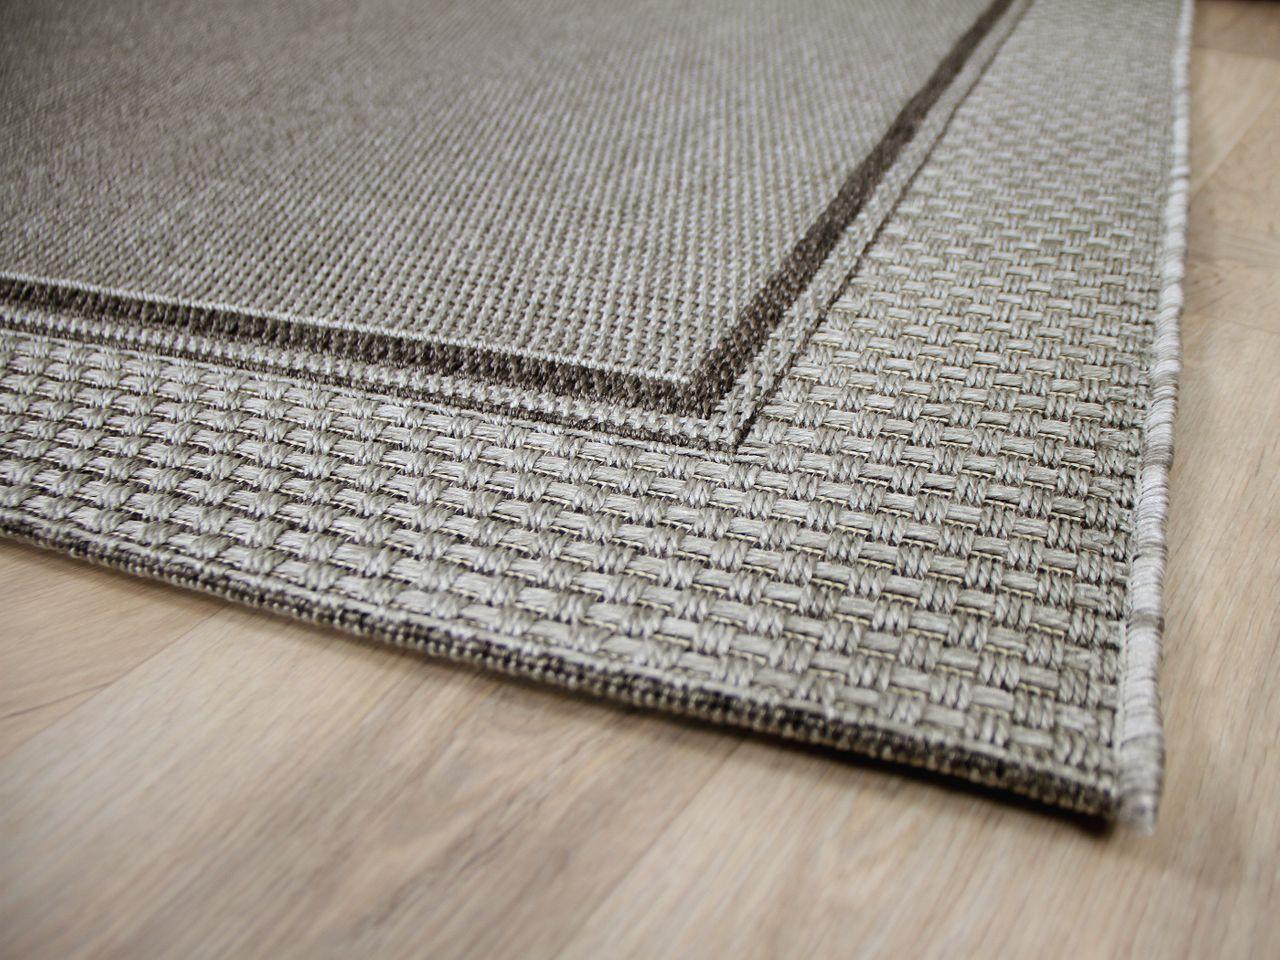 in outdoor teppich flachgewebe natur panama grau bord re kaufen bei teppichversand24. Black Bedroom Furniture Sets. Home Design Ideas